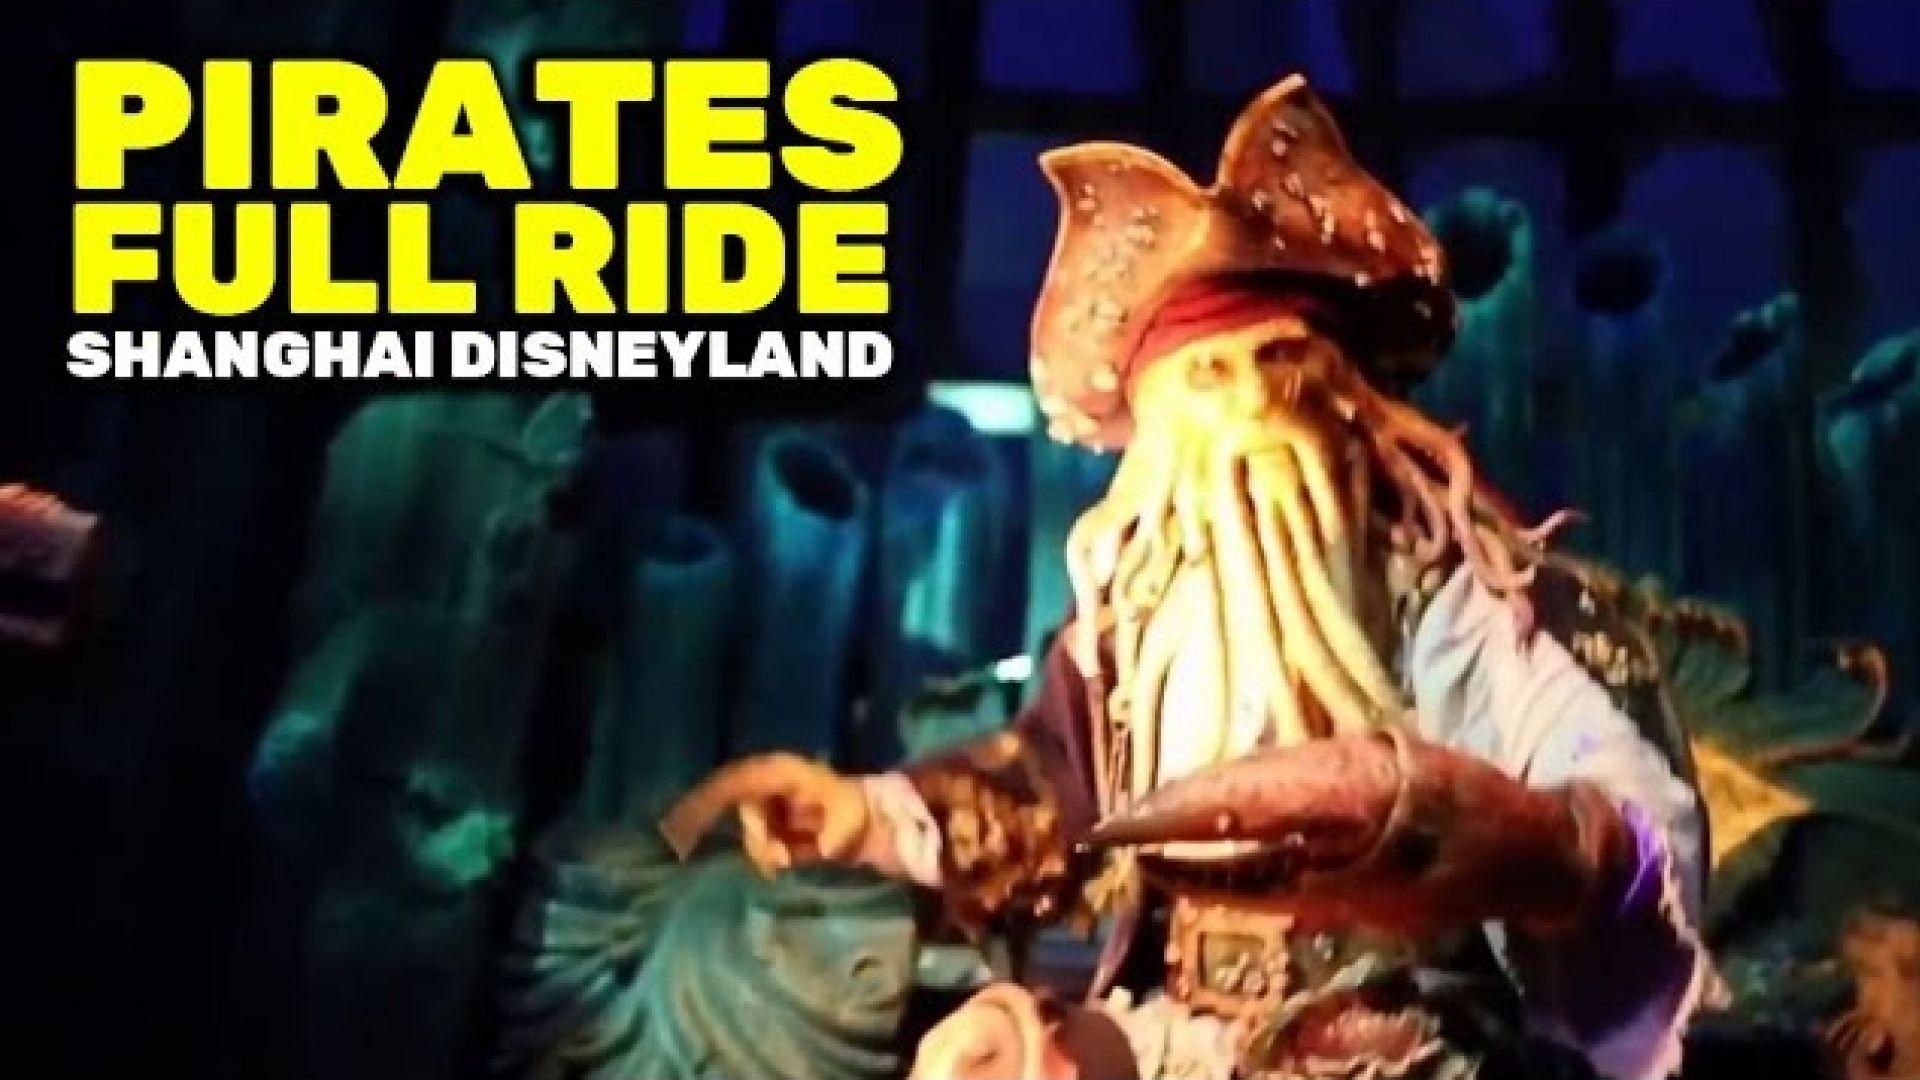 Pirates of The Caribbean At Shanghai Disneyland